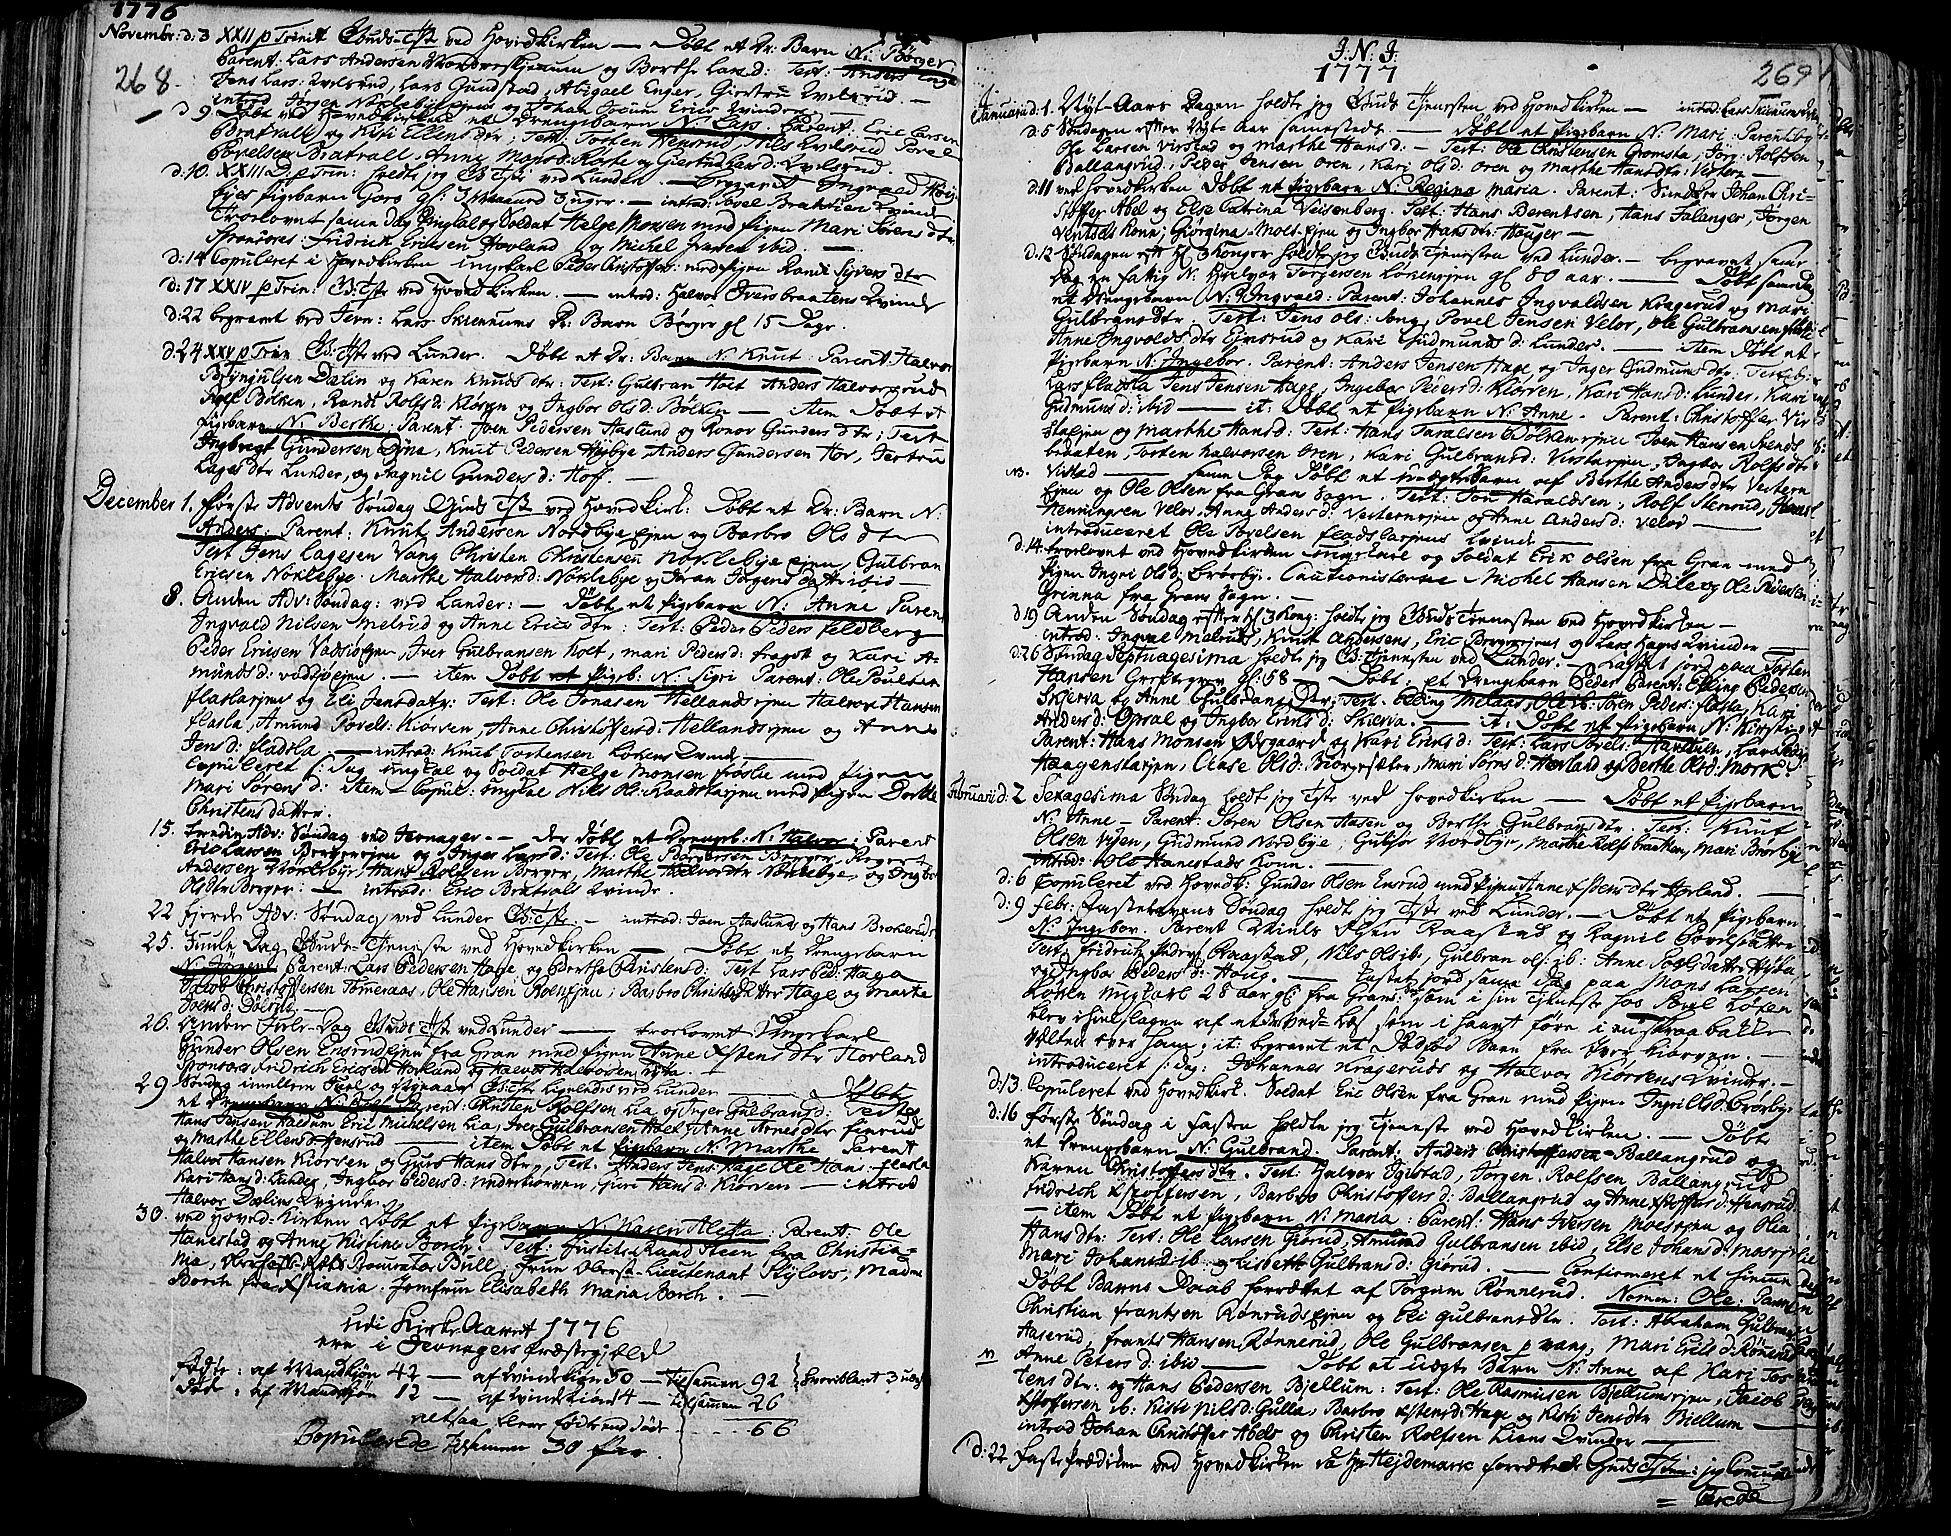 SAH, Jevnaker prestekontor, Ministerialbok nr. 3, 1752-1799, s. 268-269